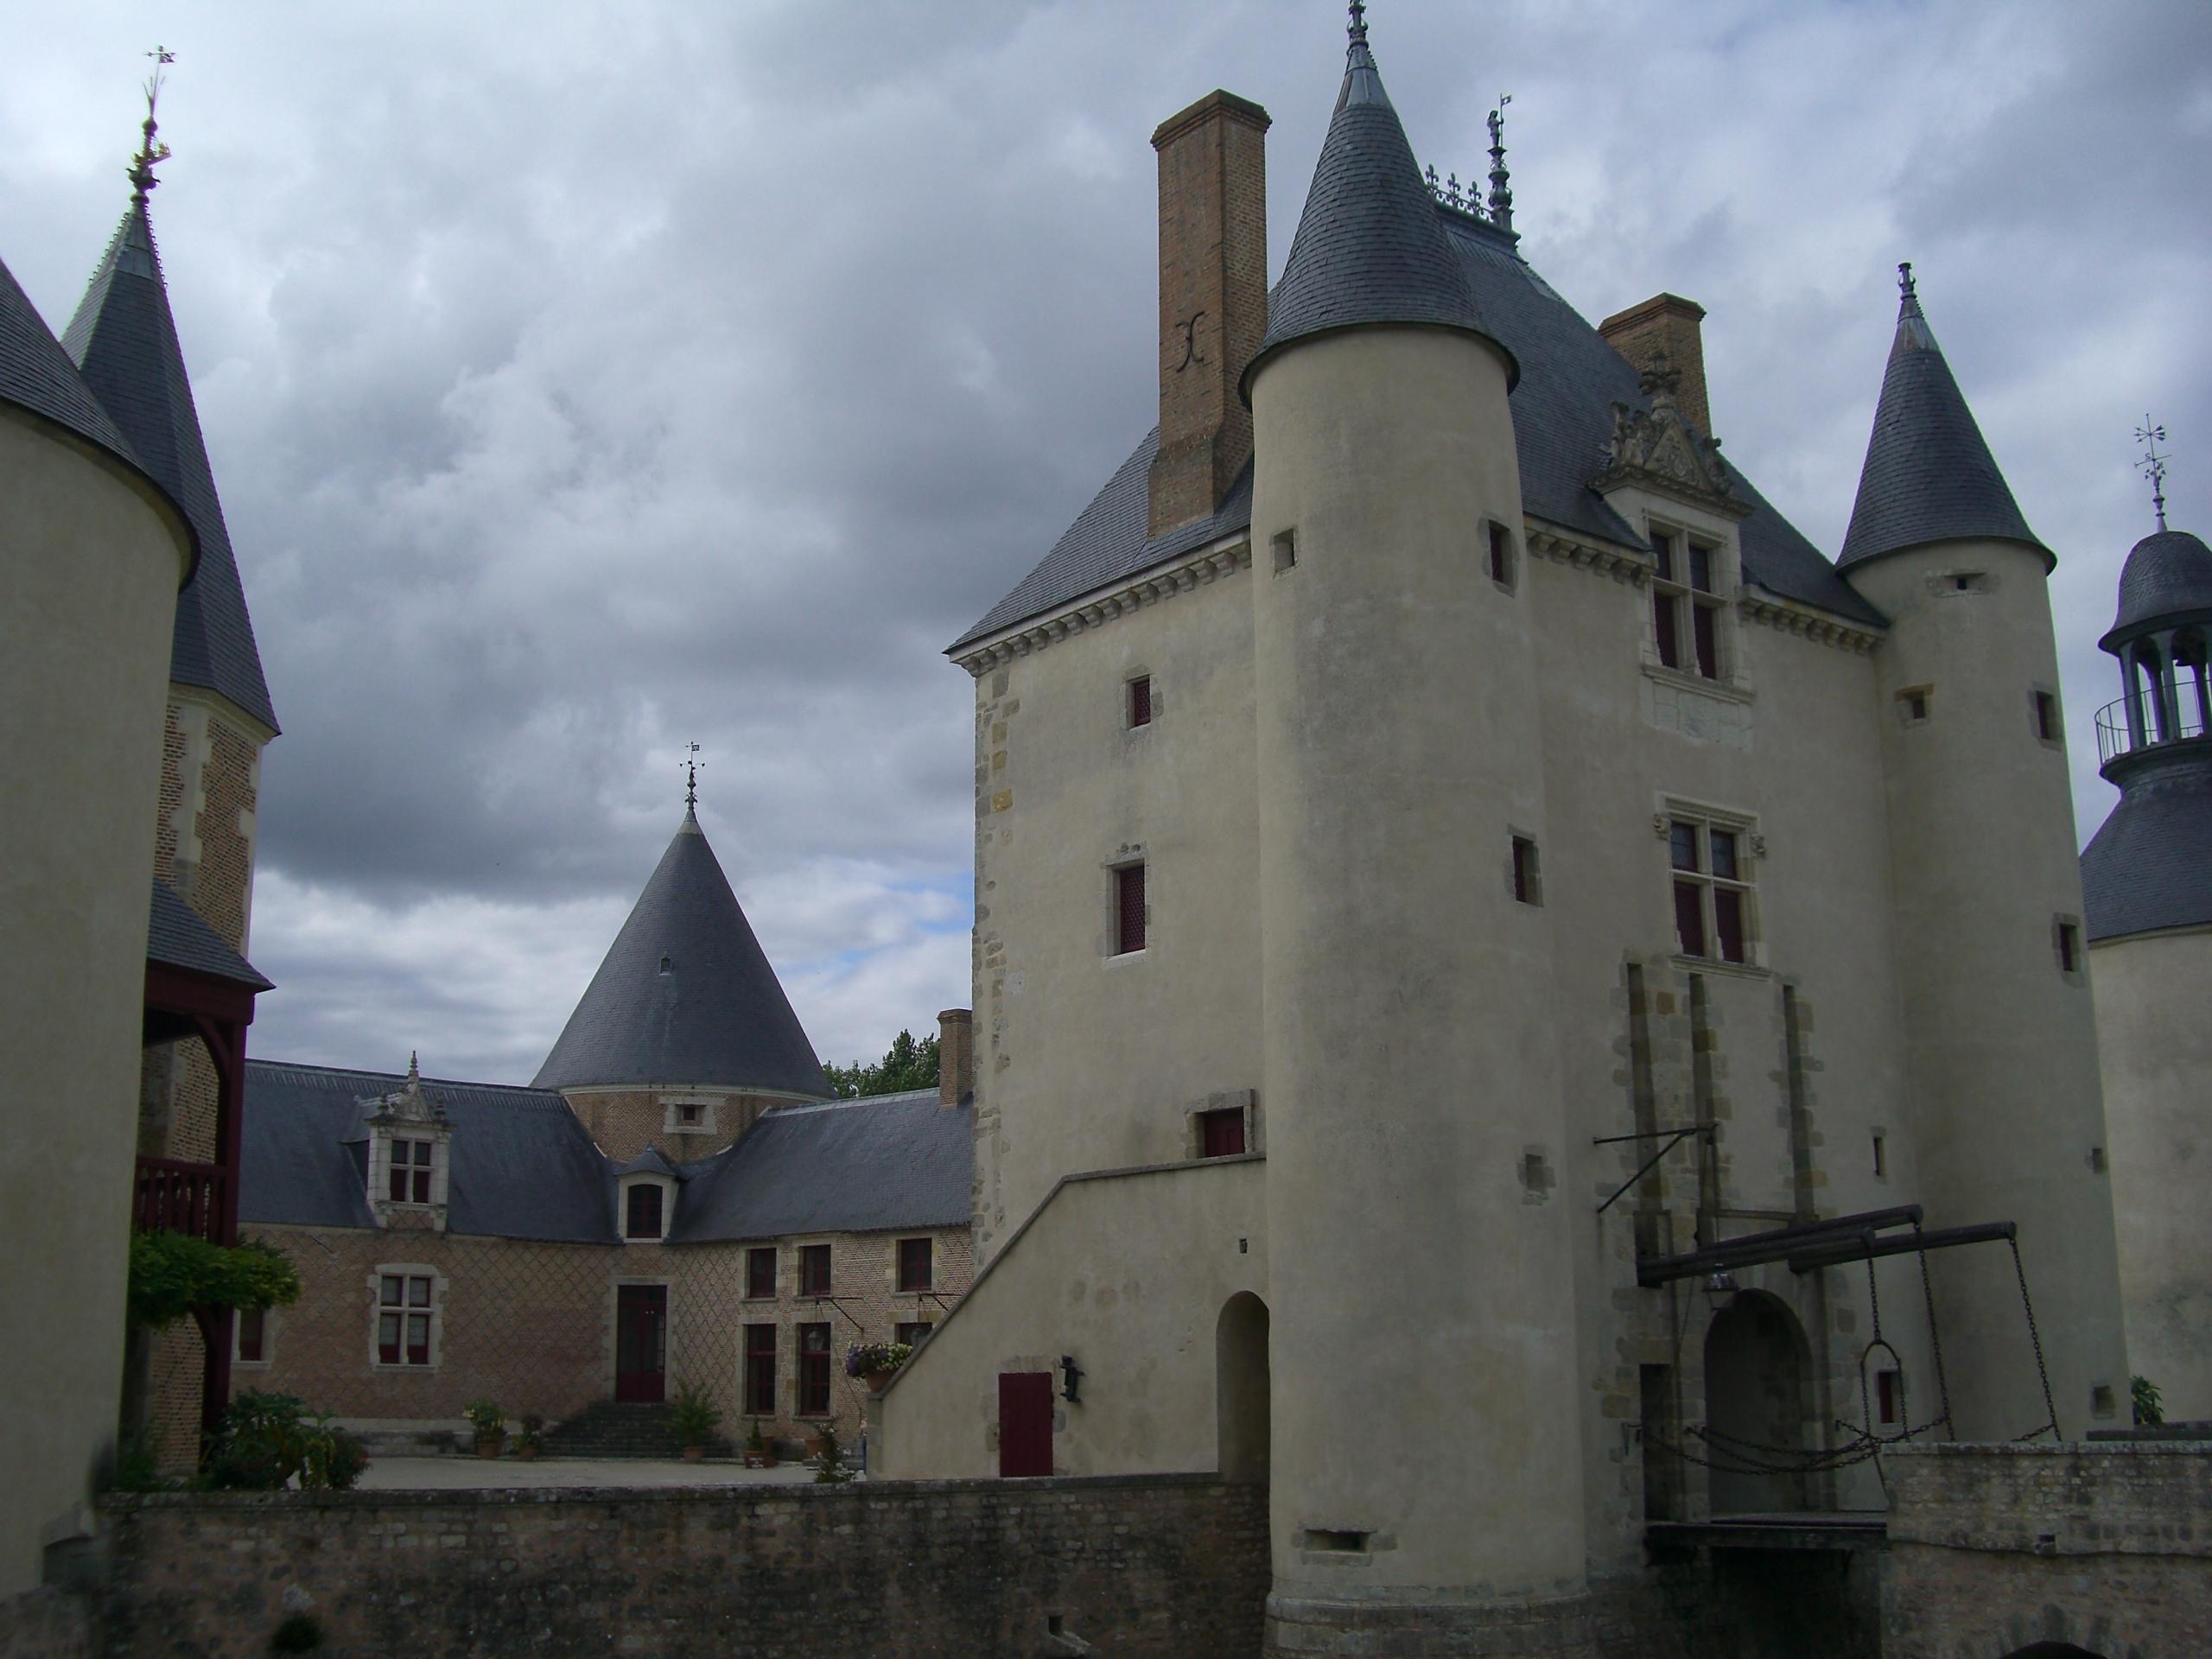 cimg4093jpg - Chateau De Chamerolles Mariage